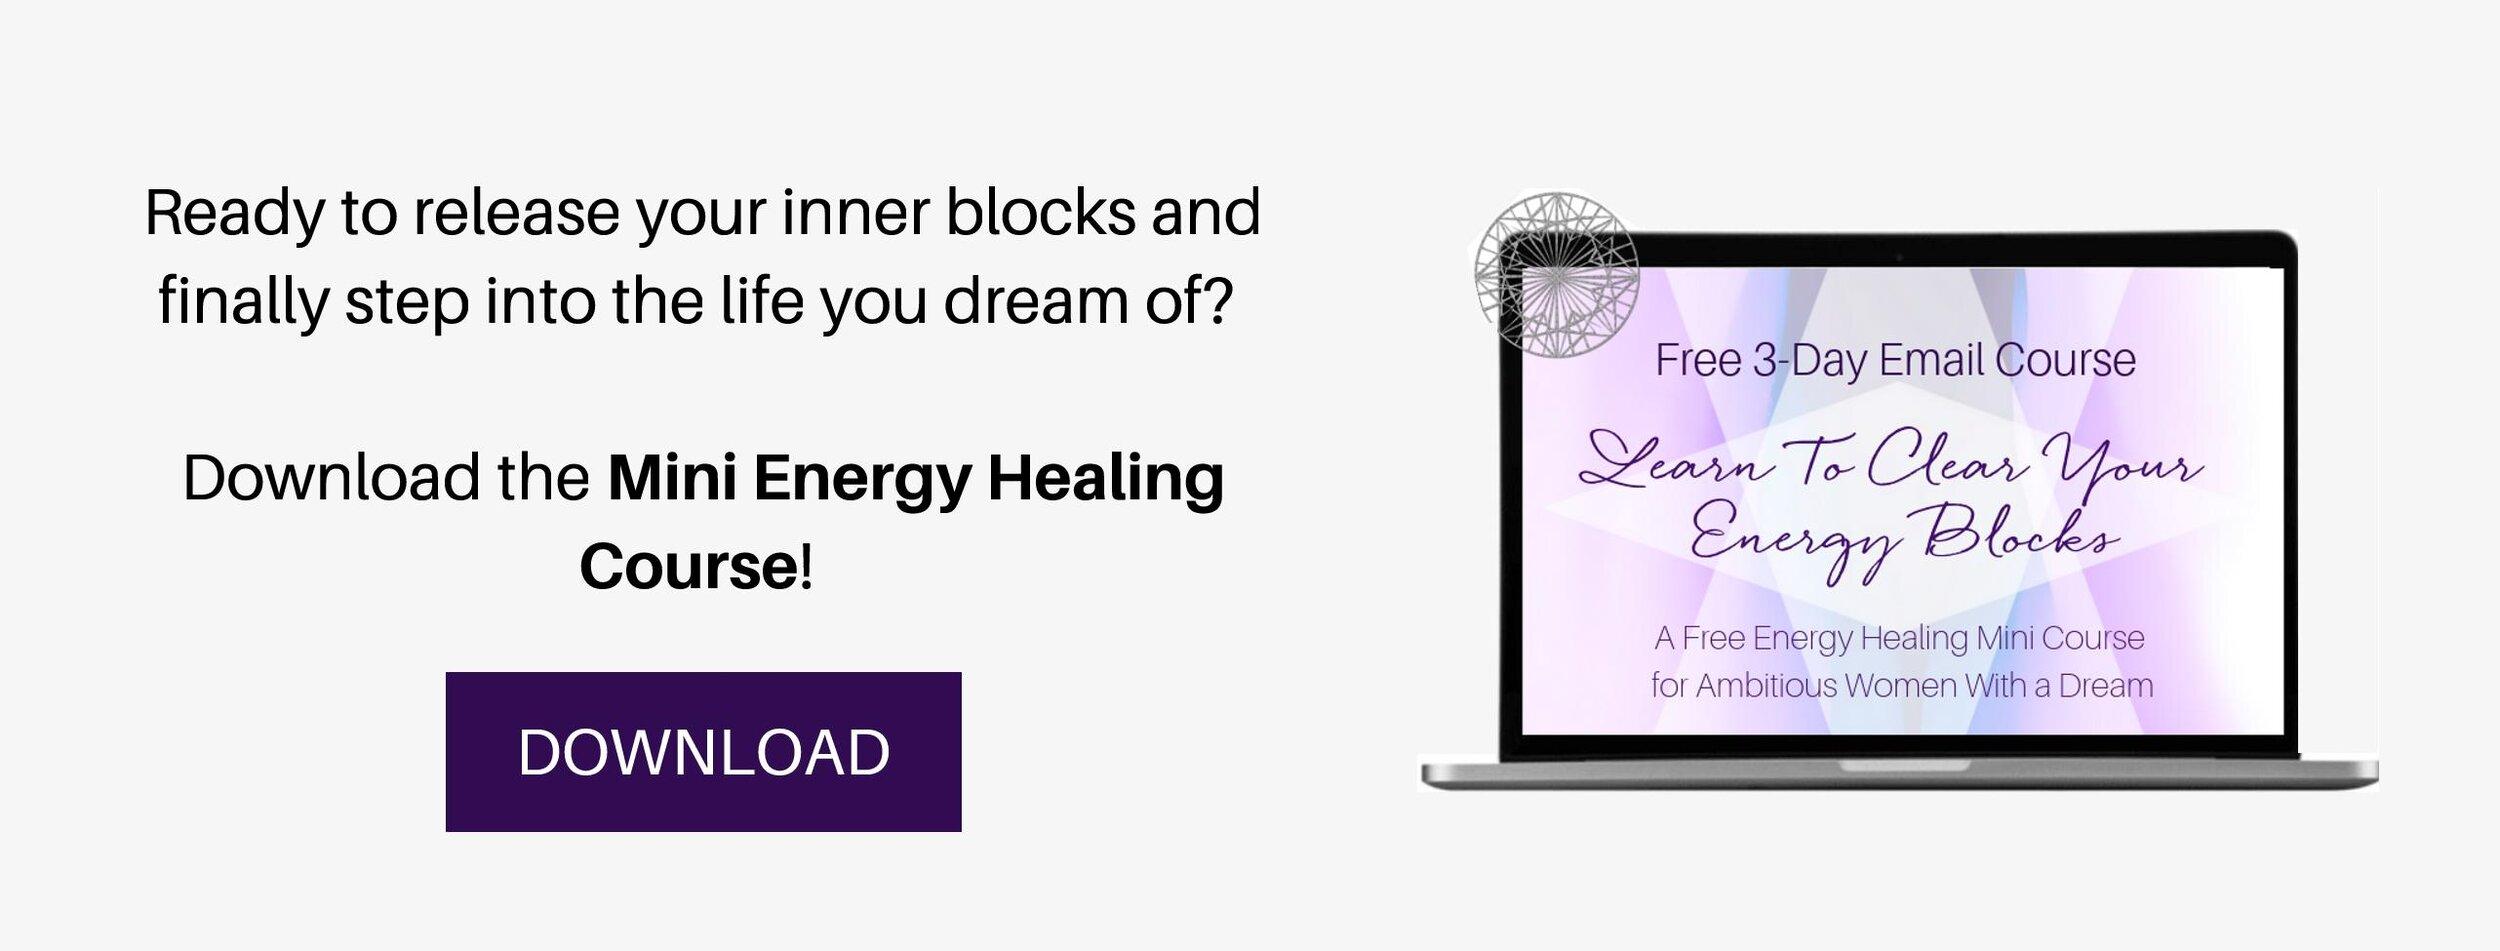 energy-healing-mini-course-banner.jpg